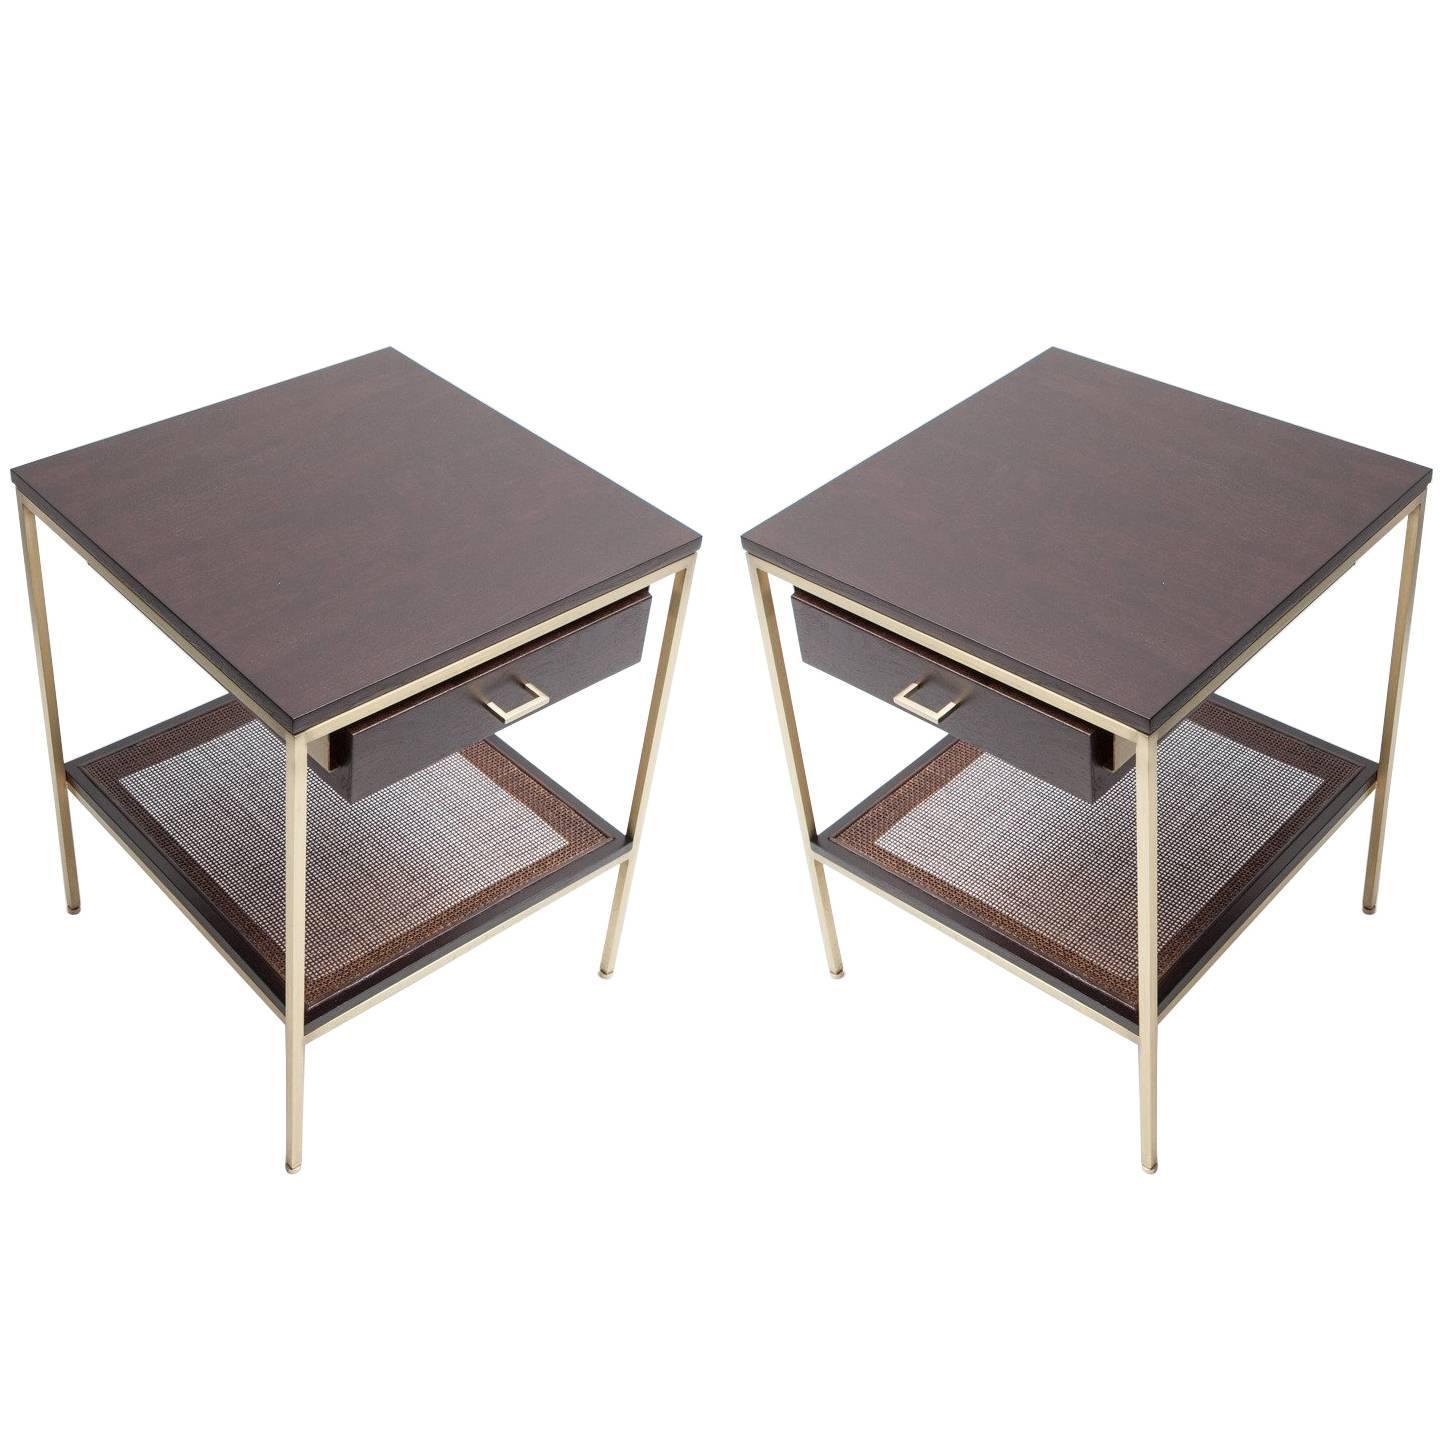 Pair of reGeneration Custom Ebony and Caned Bedside Tables